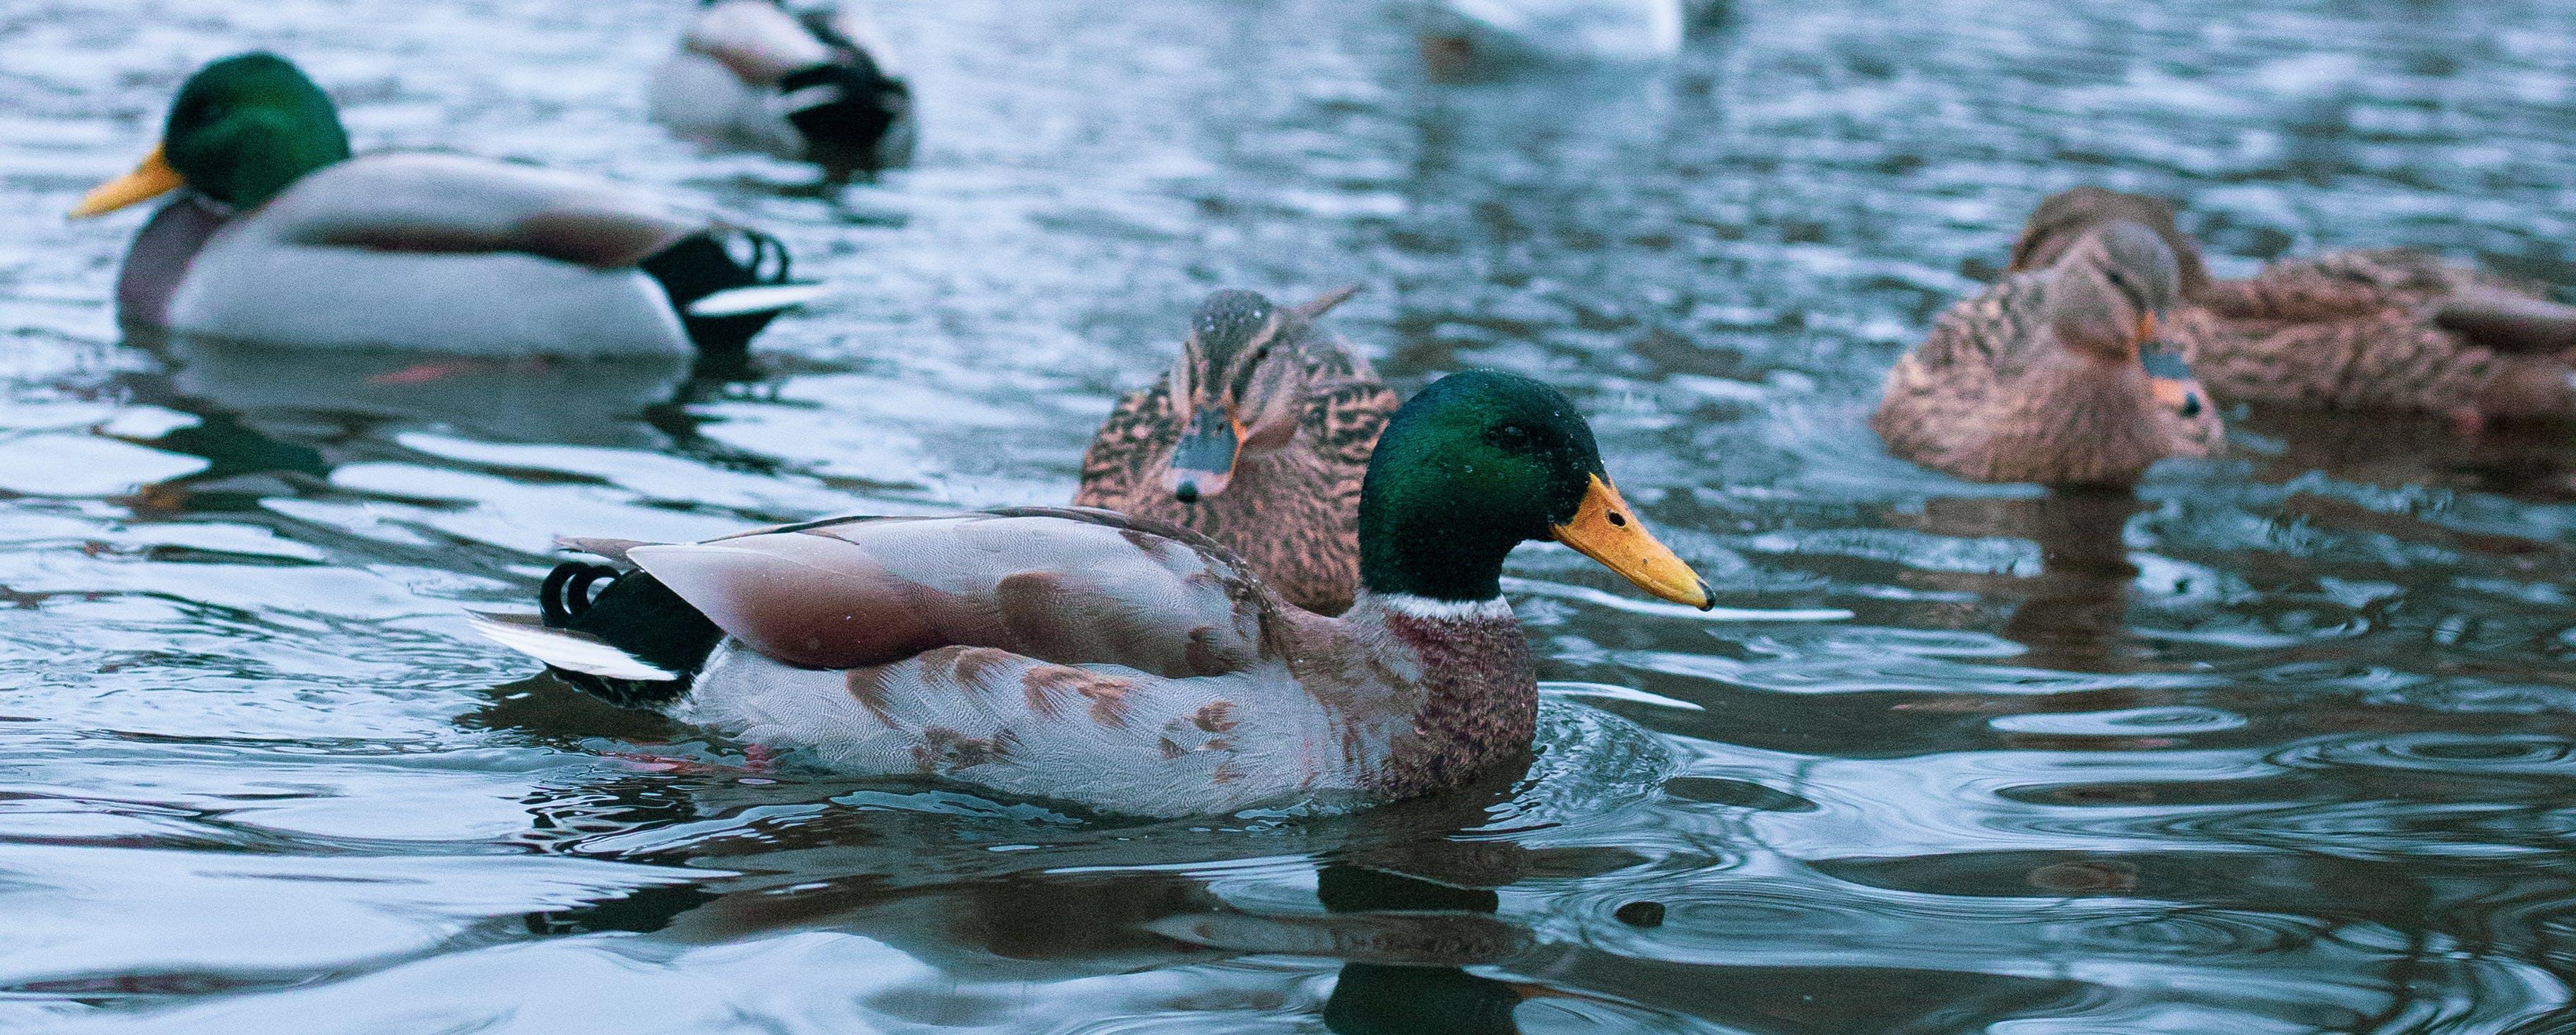 Free stock photo of duck, lake, water